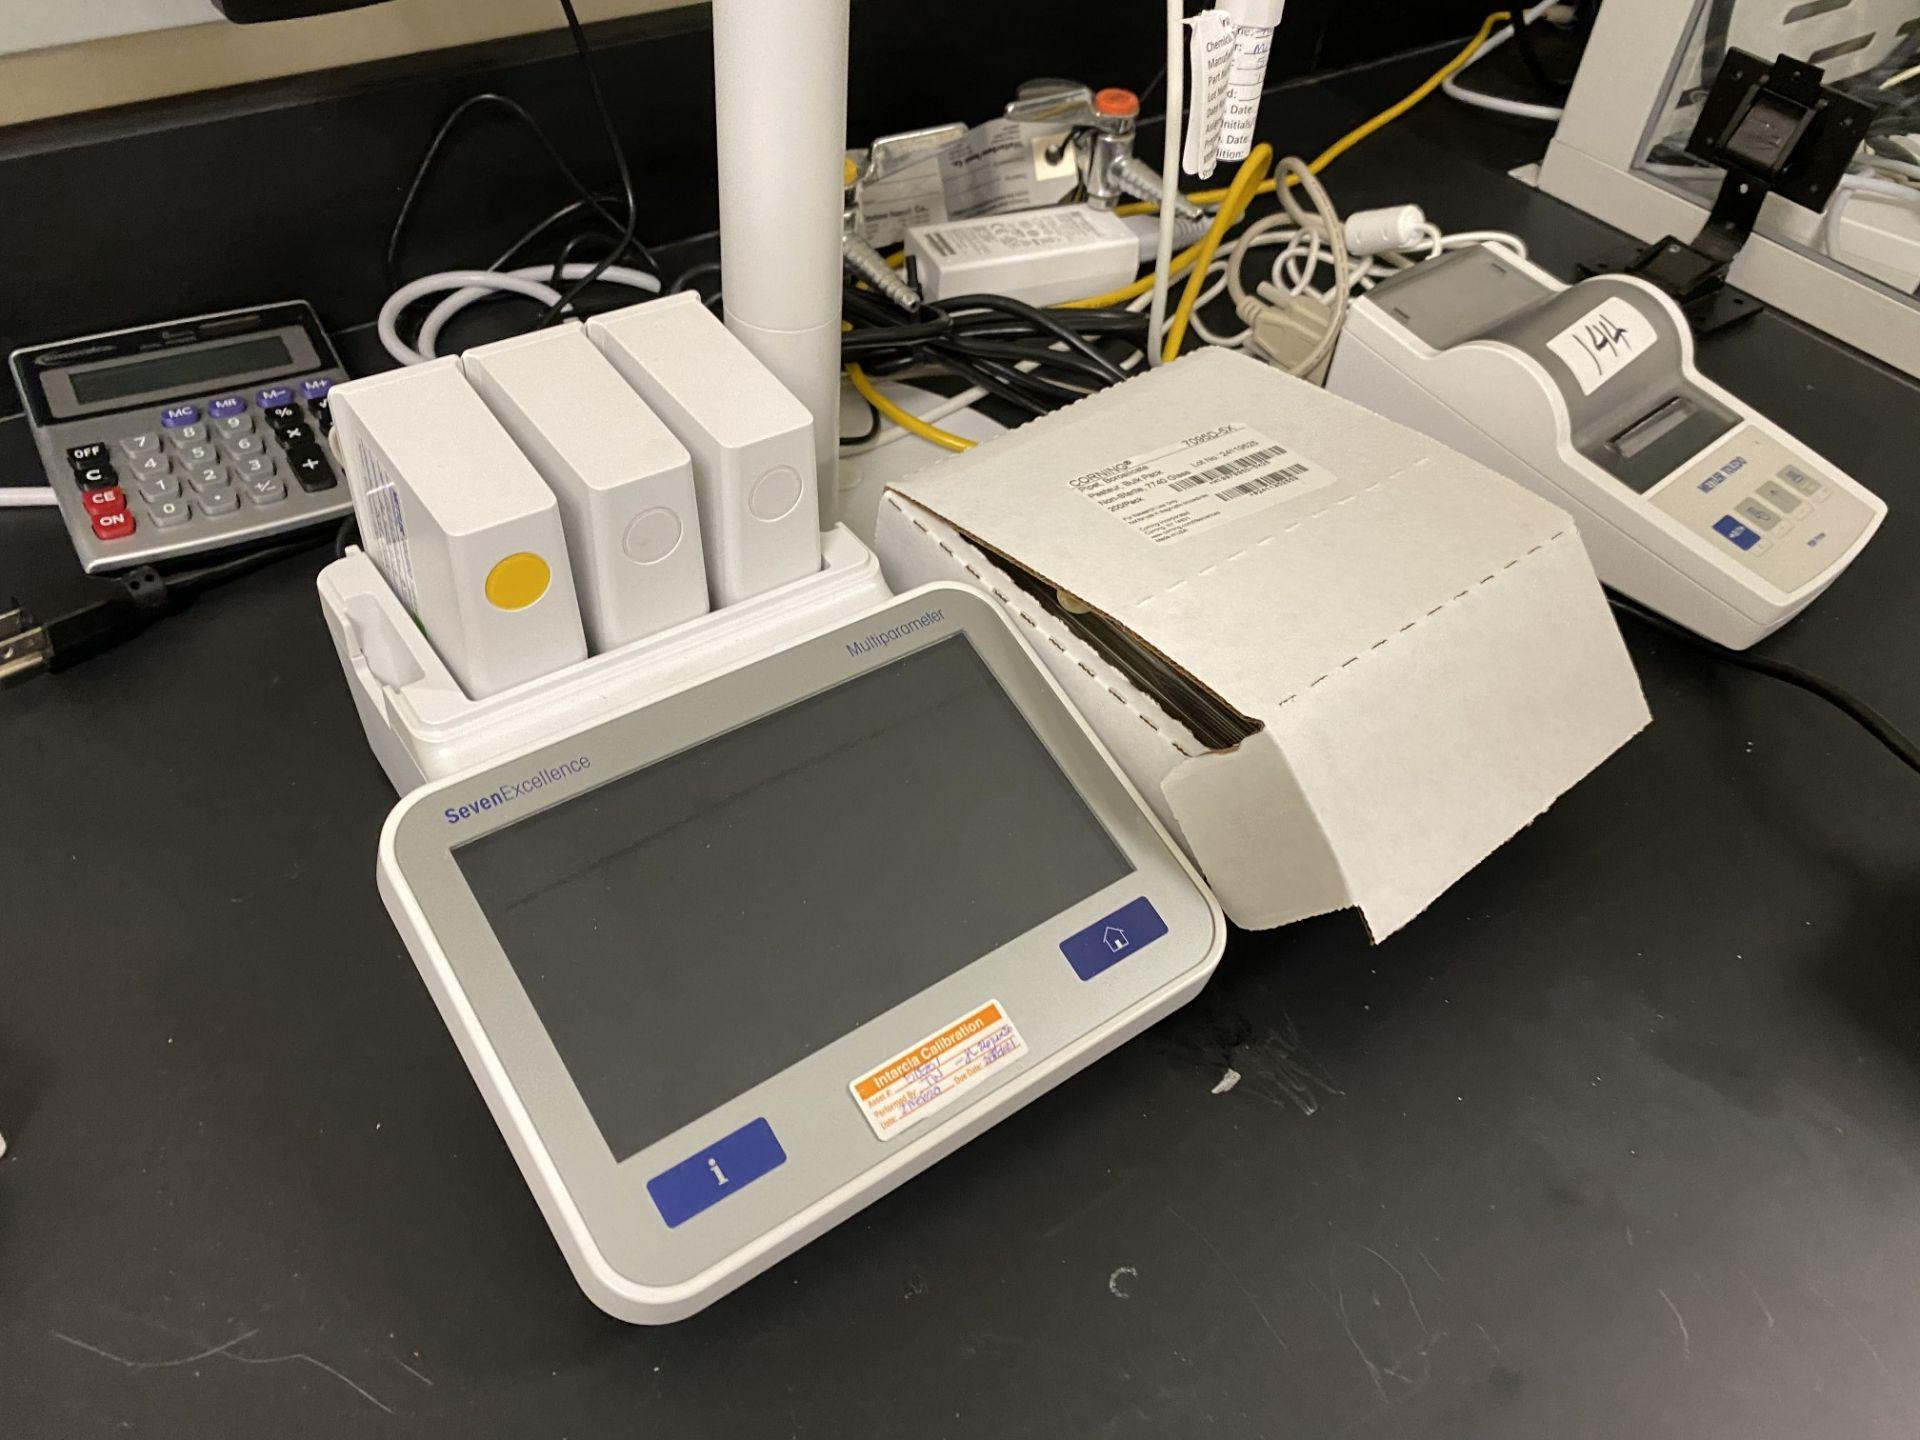 pH Meter - Image 4 of 6